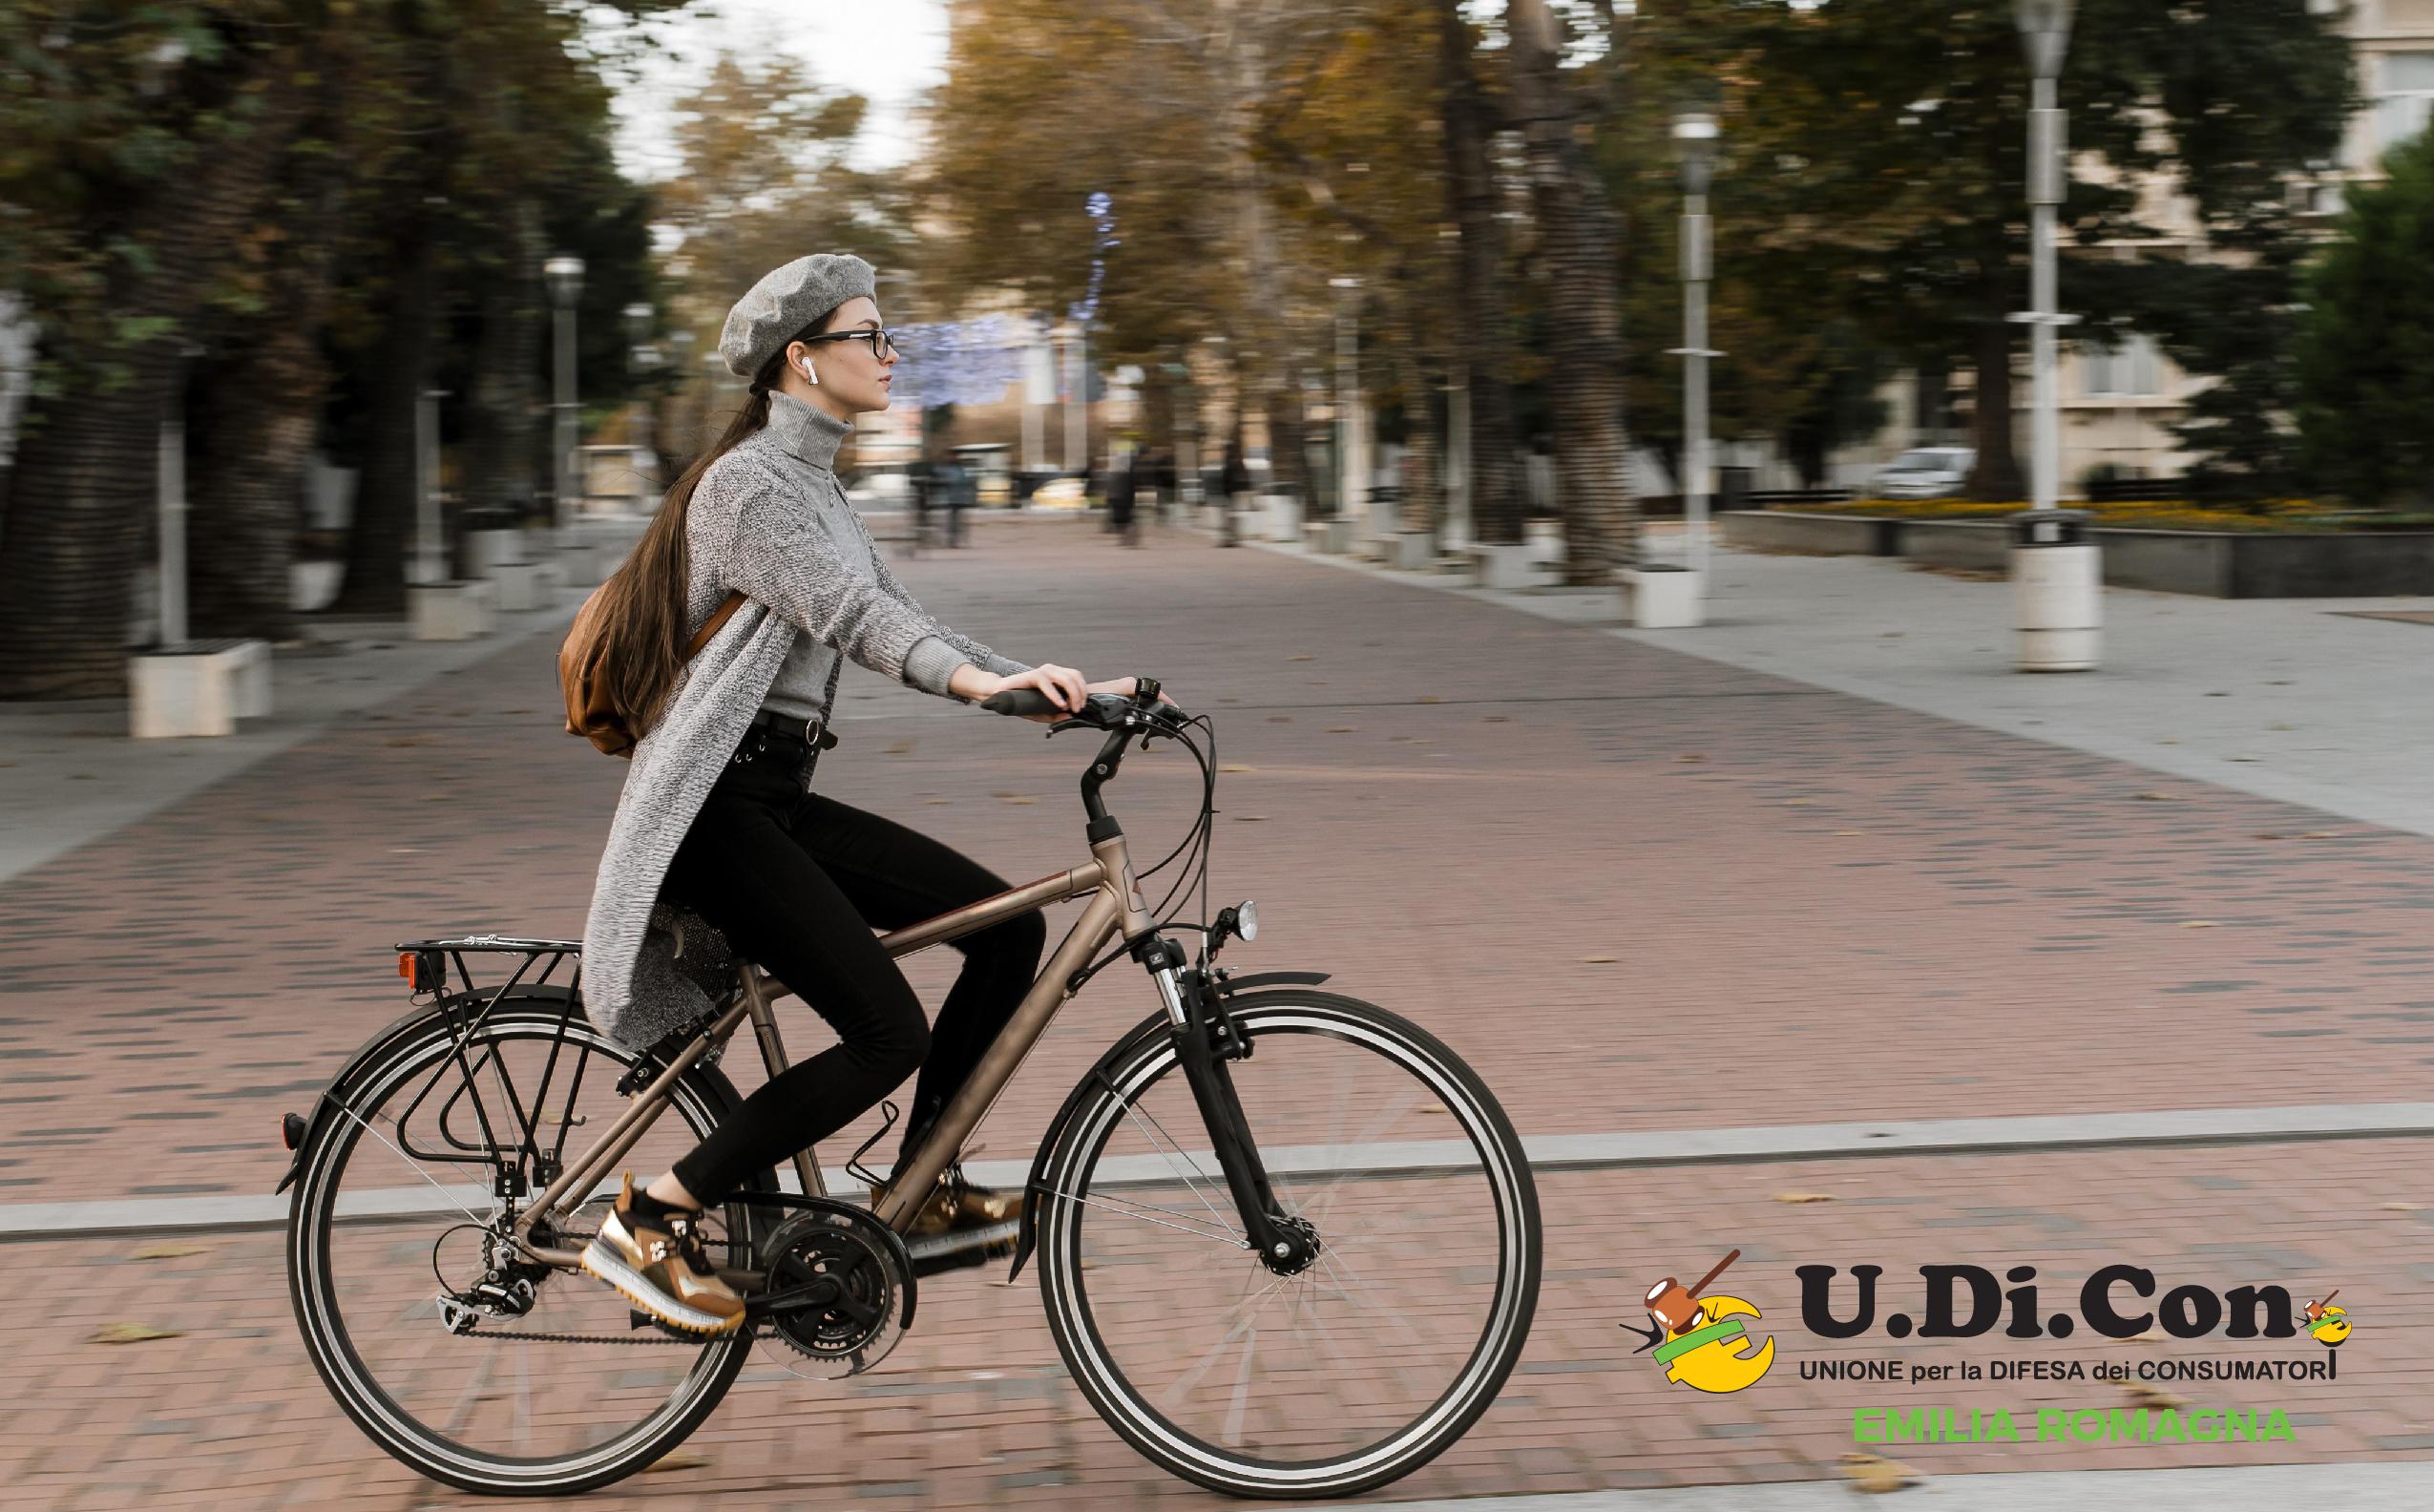 Bonus mobilità: al via nuovi rimborsi